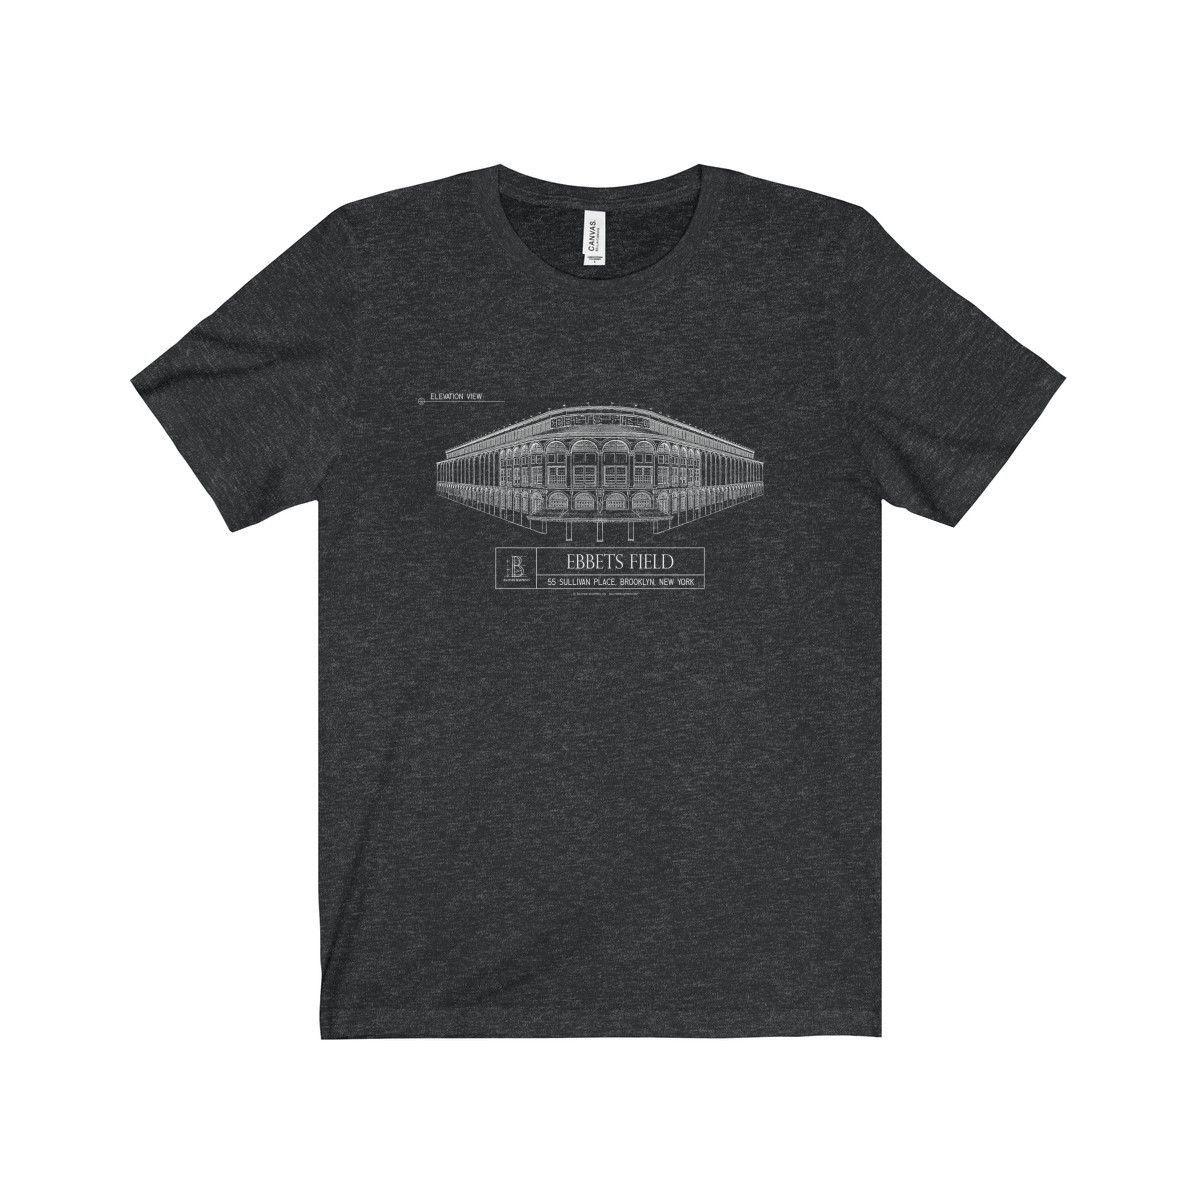 Ebbets Field Jersey Short Sleeve Tee